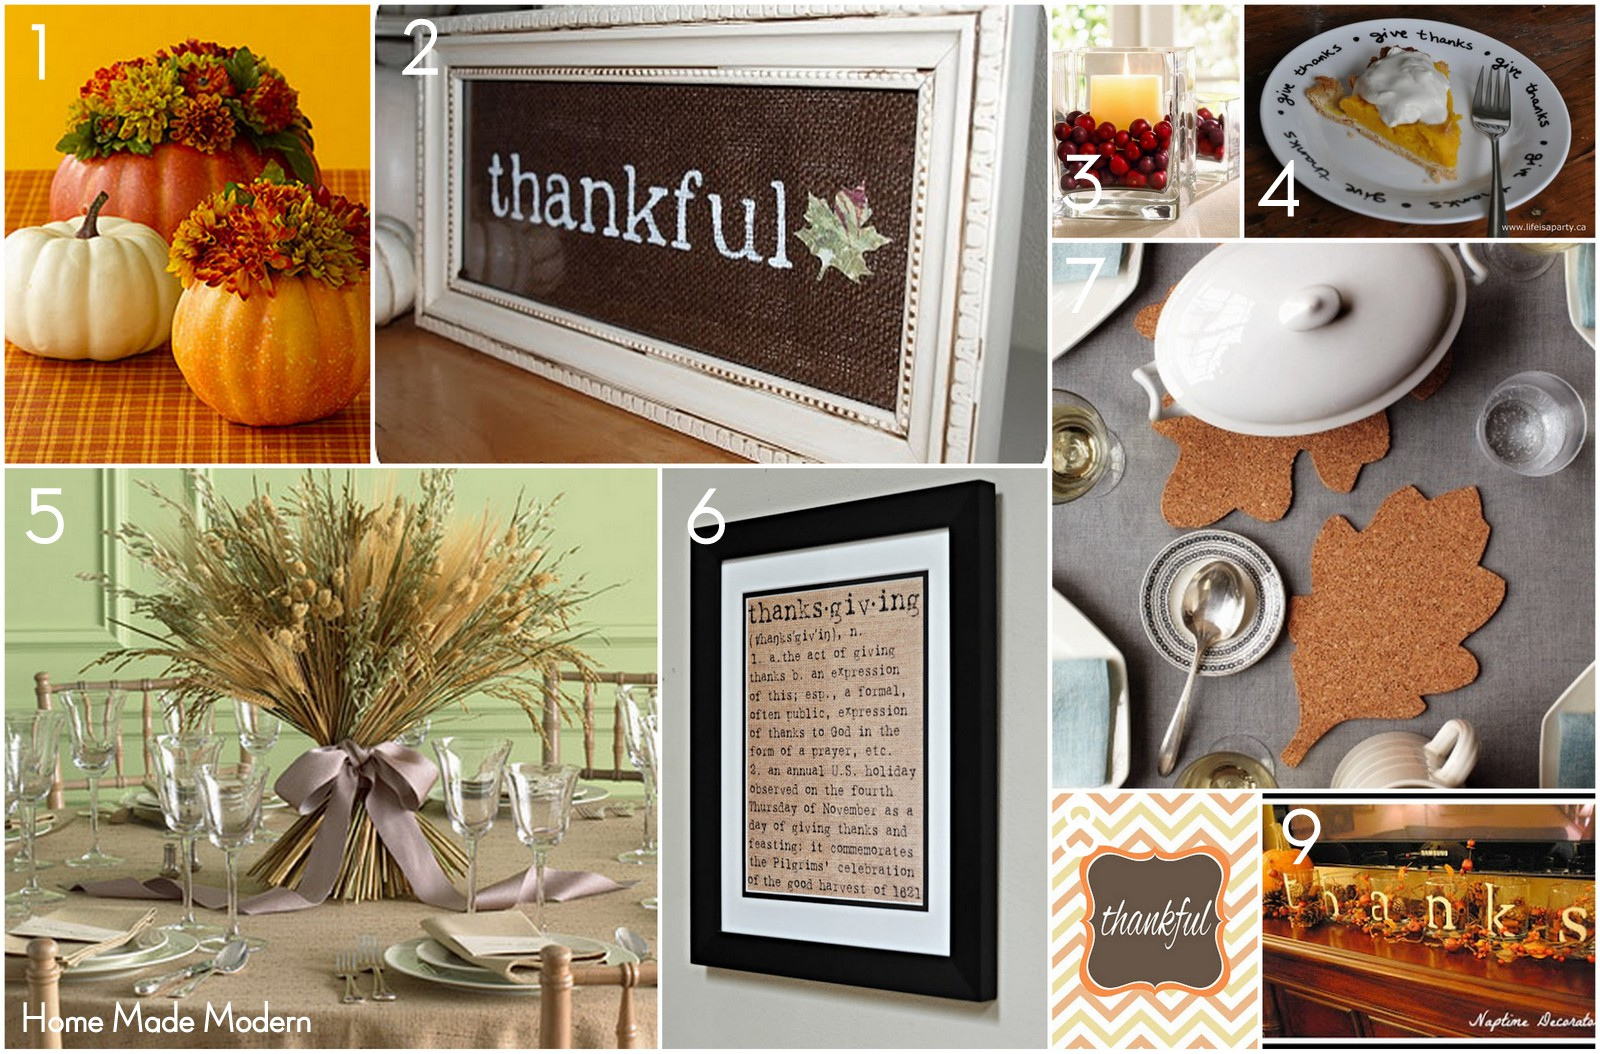 Home made modern pinterest simple thanksgiving ideas for Thanksgiving home decorations pinterest